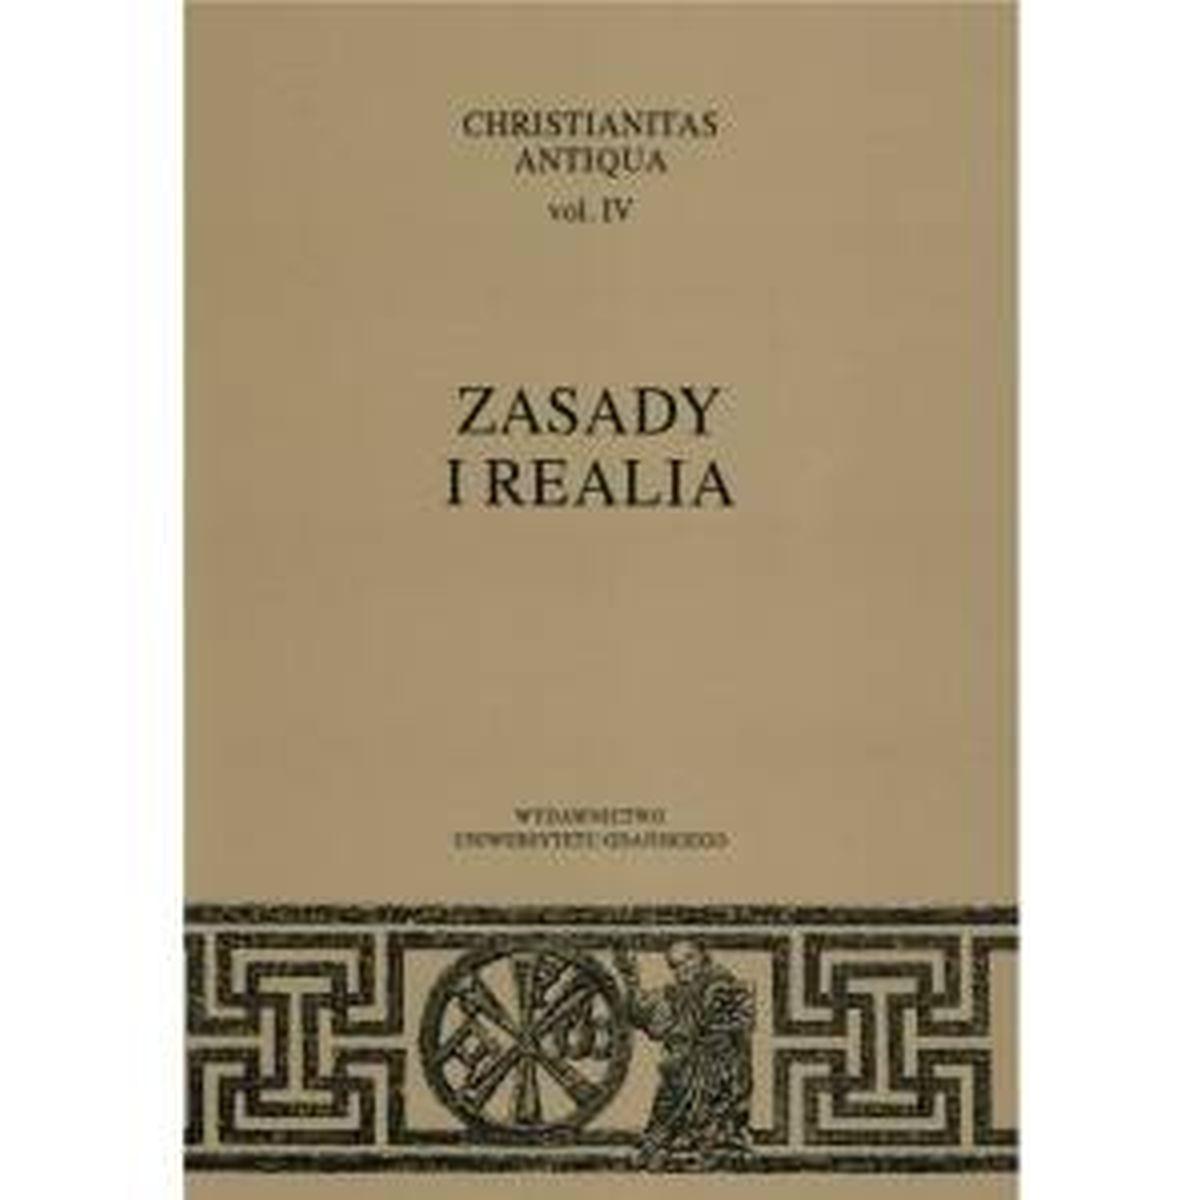 Christianitas Antiqua vol. IV. Zasady i realia